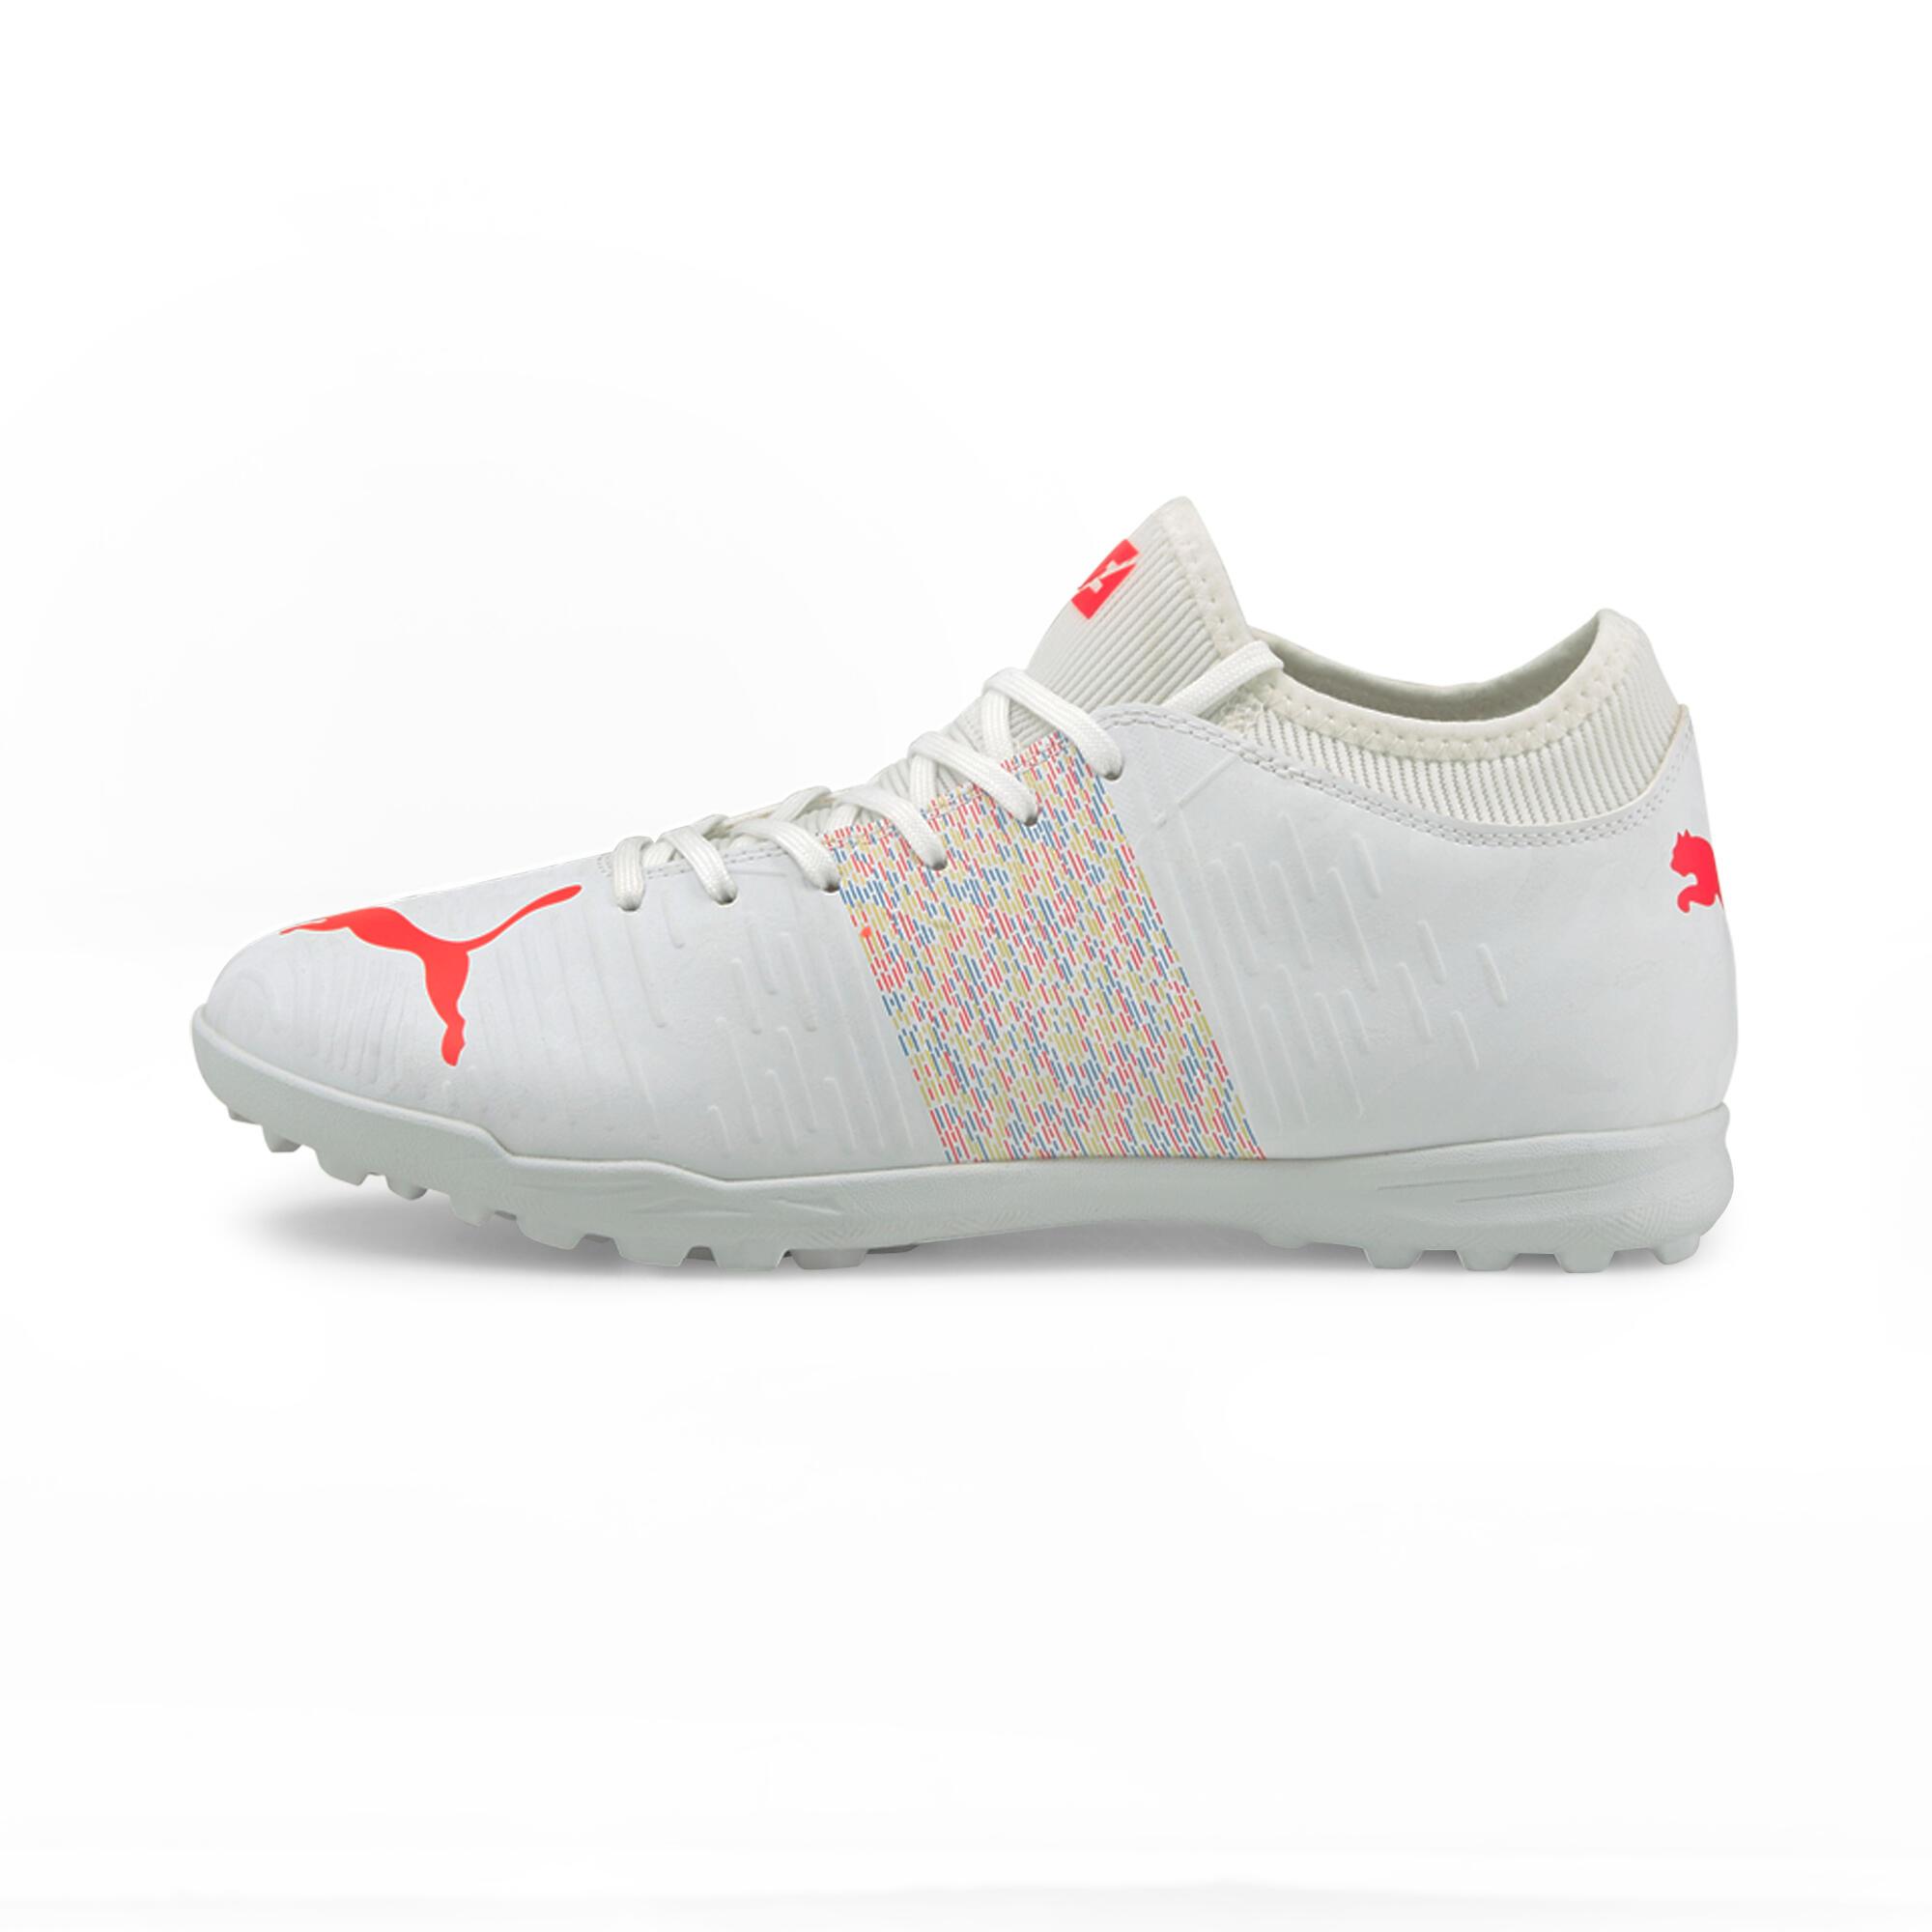 Chaussures de football FUTURE 4.1 HG EURO PUMA homme